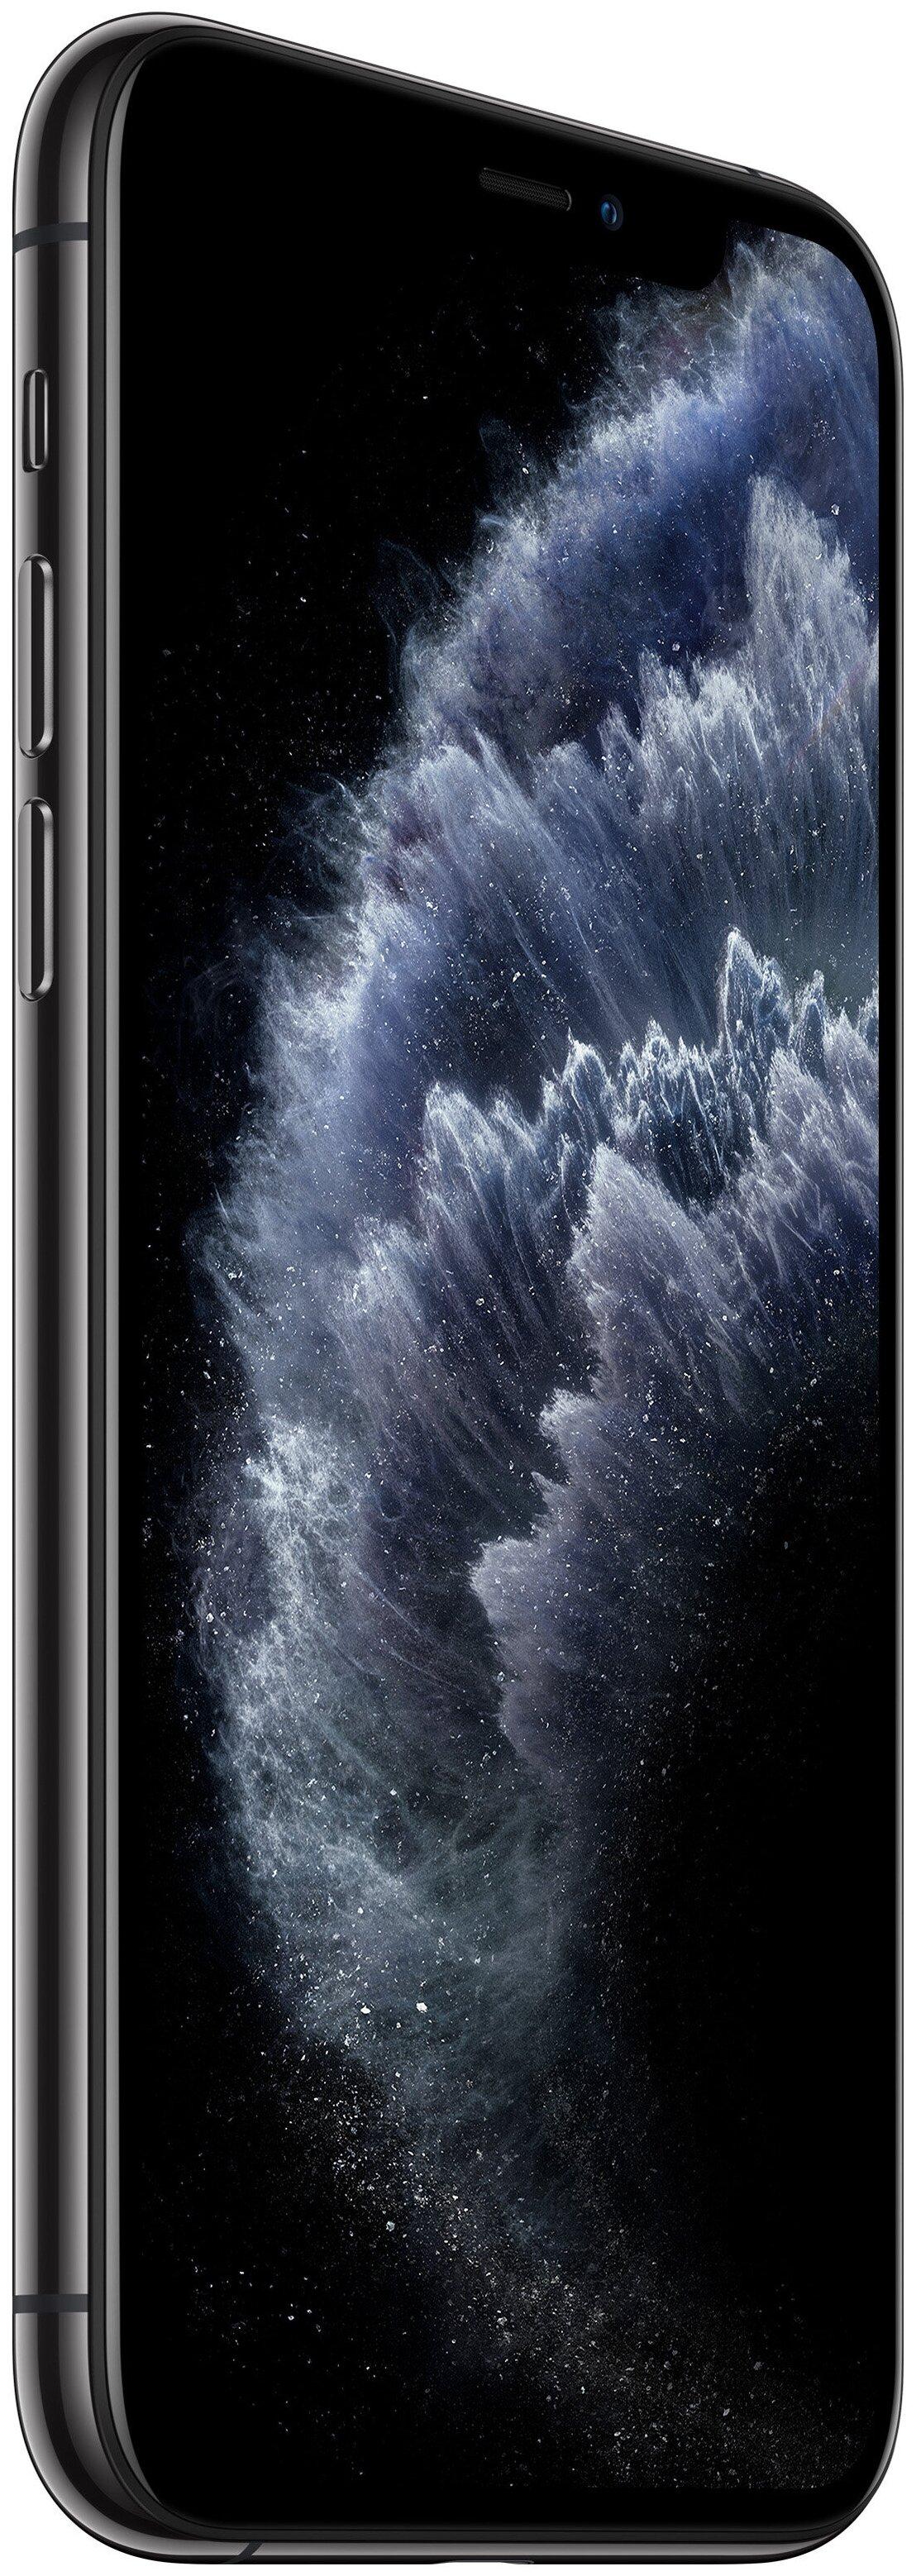 Apple iPhone 11 Pro 512GB - процессор: Apple A13Bionic